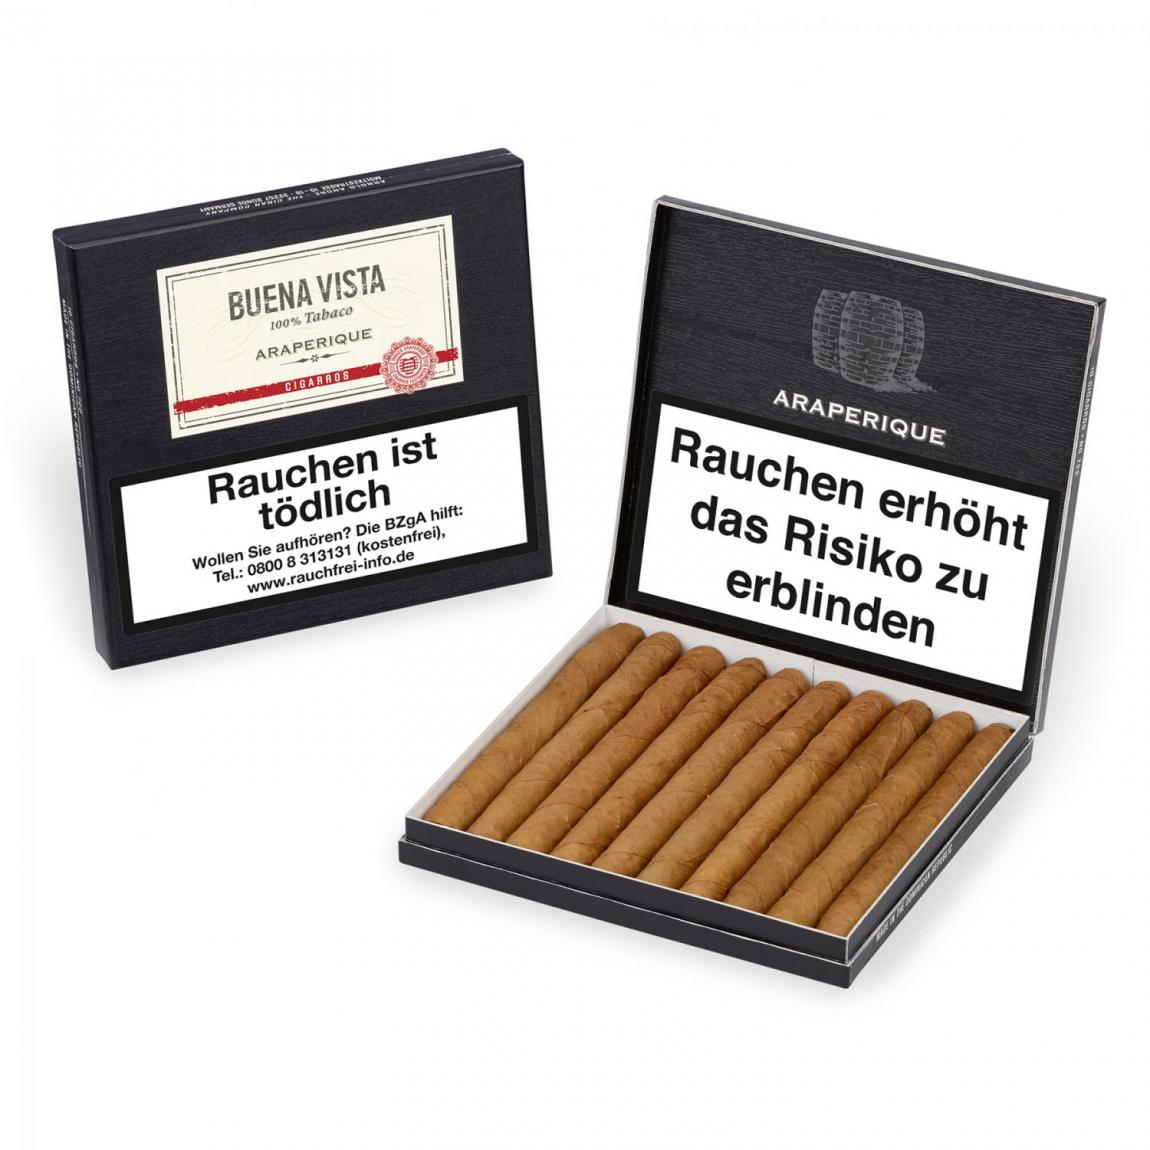 Buena Vista »Araperique« Cigarros 10er Schachtel